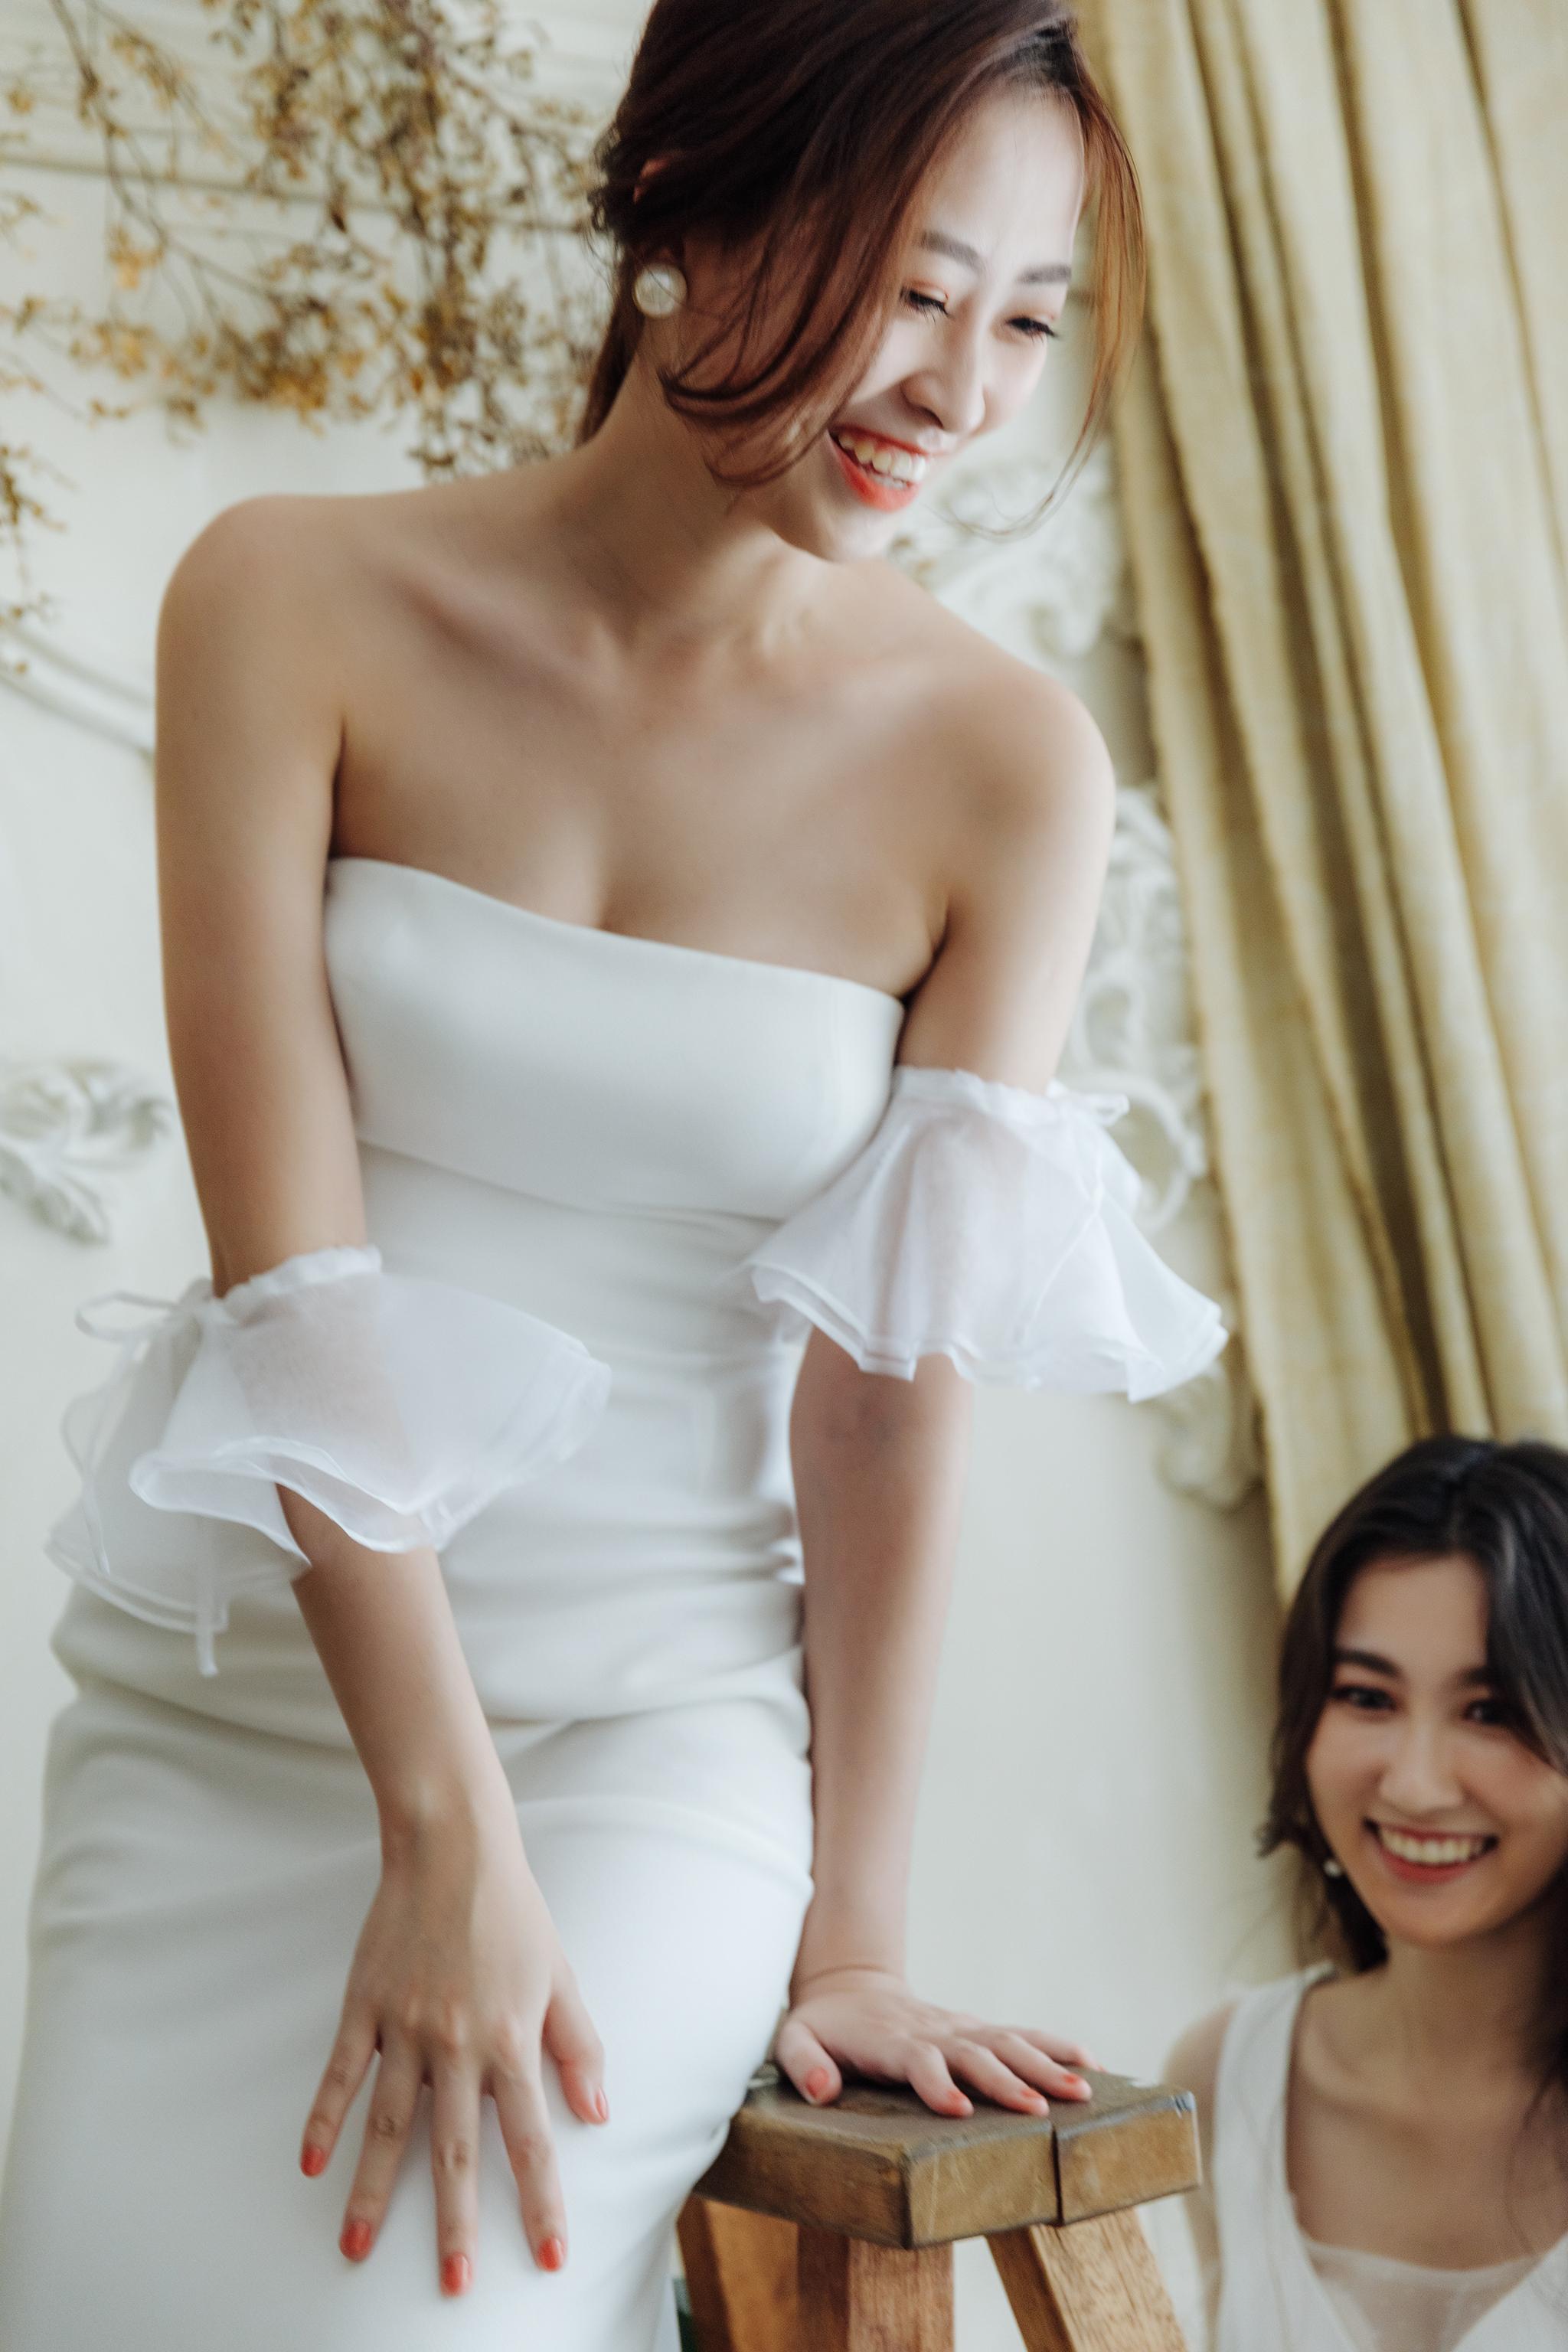 49929256431 6143b1a8dc o - 【閨蜜婚紗】+Jessy & Tiffany+